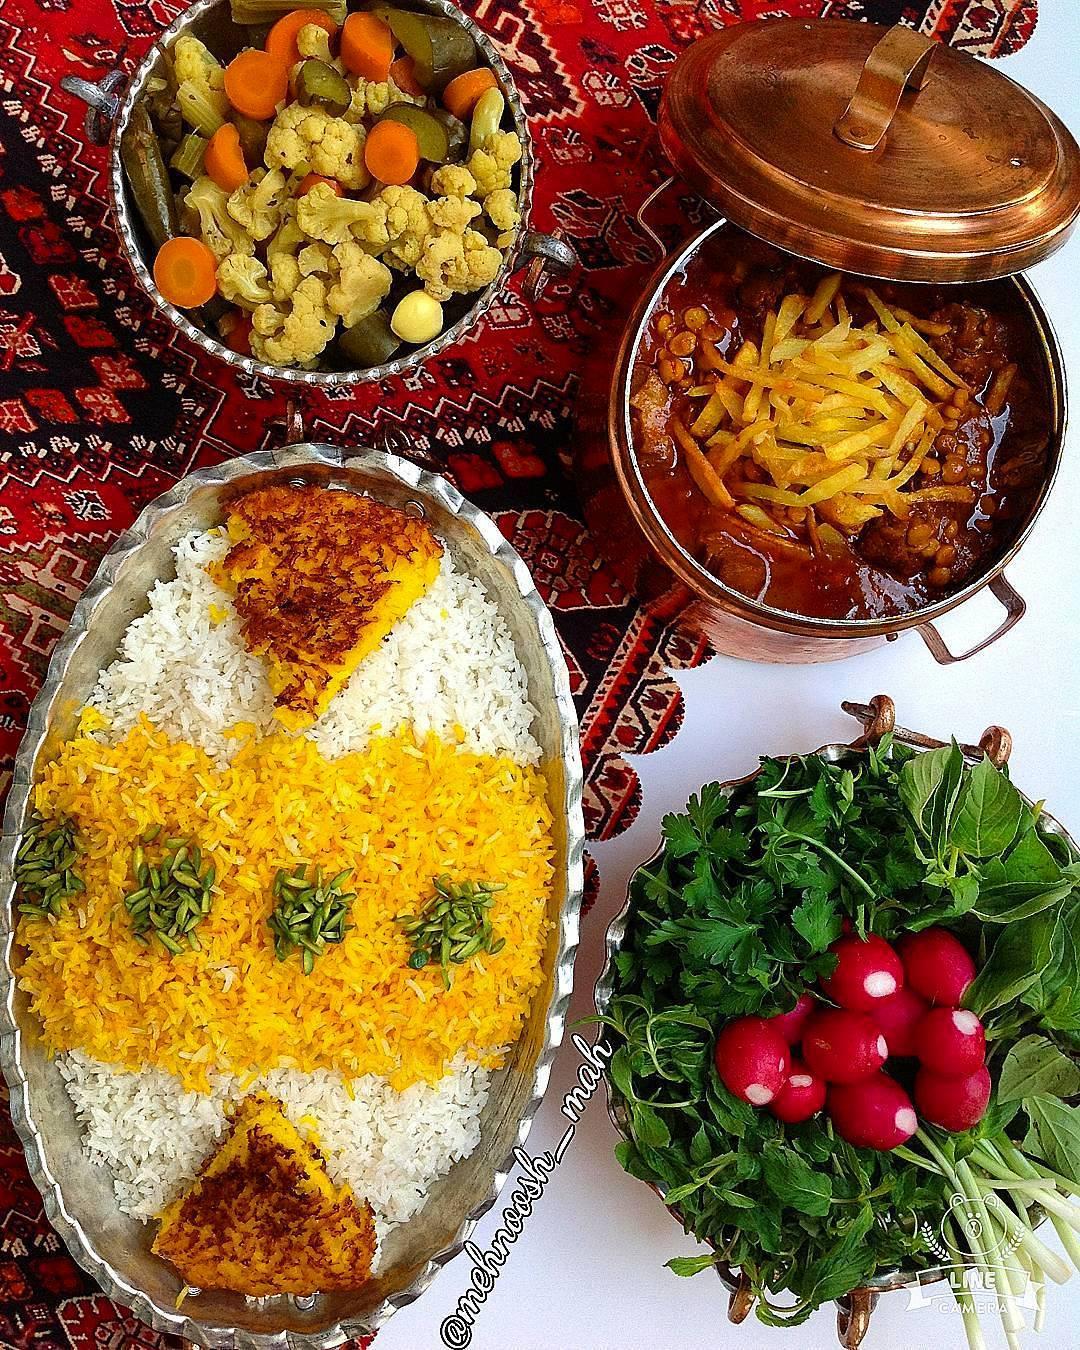 Gheyme-Khoresht-IranFood-IranTours-ZhinoTours